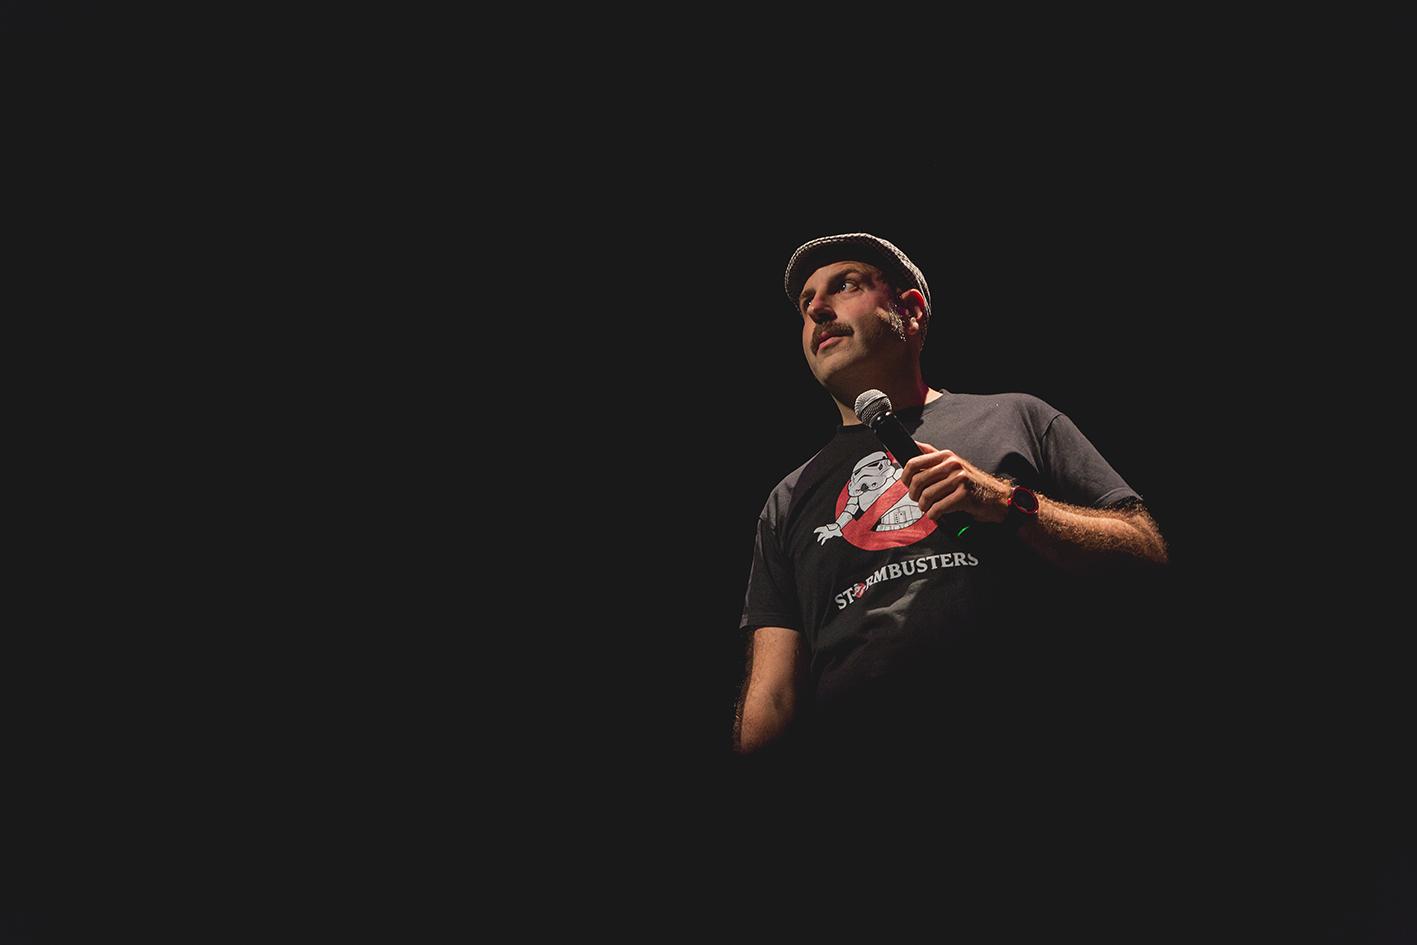 Viernes 25 - Noche Castellano-manchega - Agustín Durán